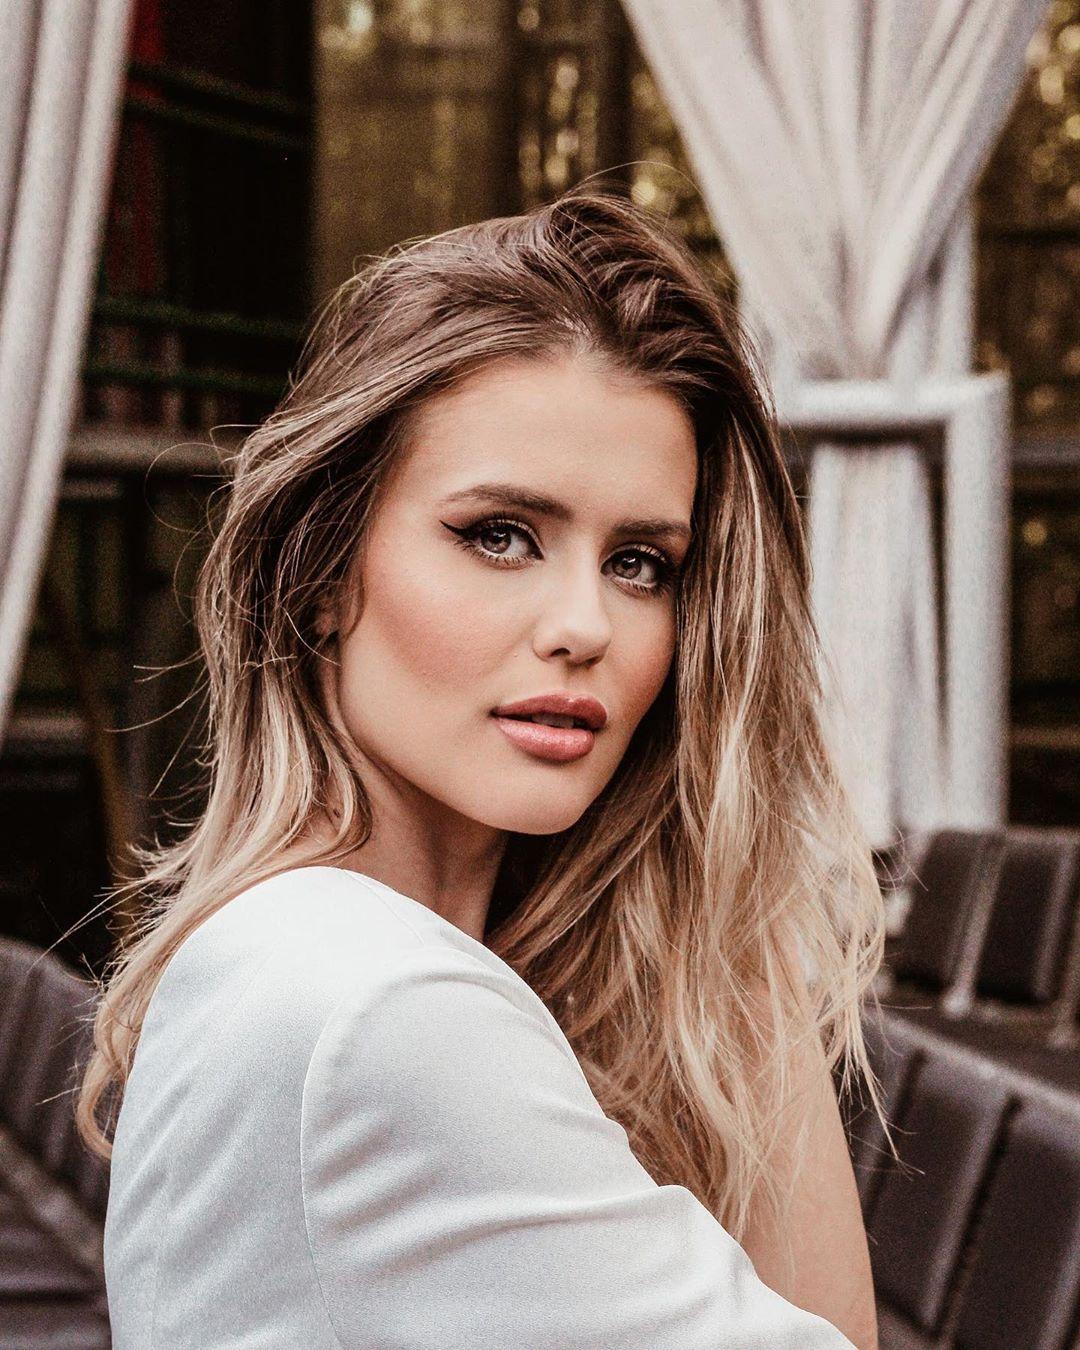 marcella kozinski de barros, miss curitiba 2020/3rd runner-up de miss tourism world 2019. - Página 2 66298010